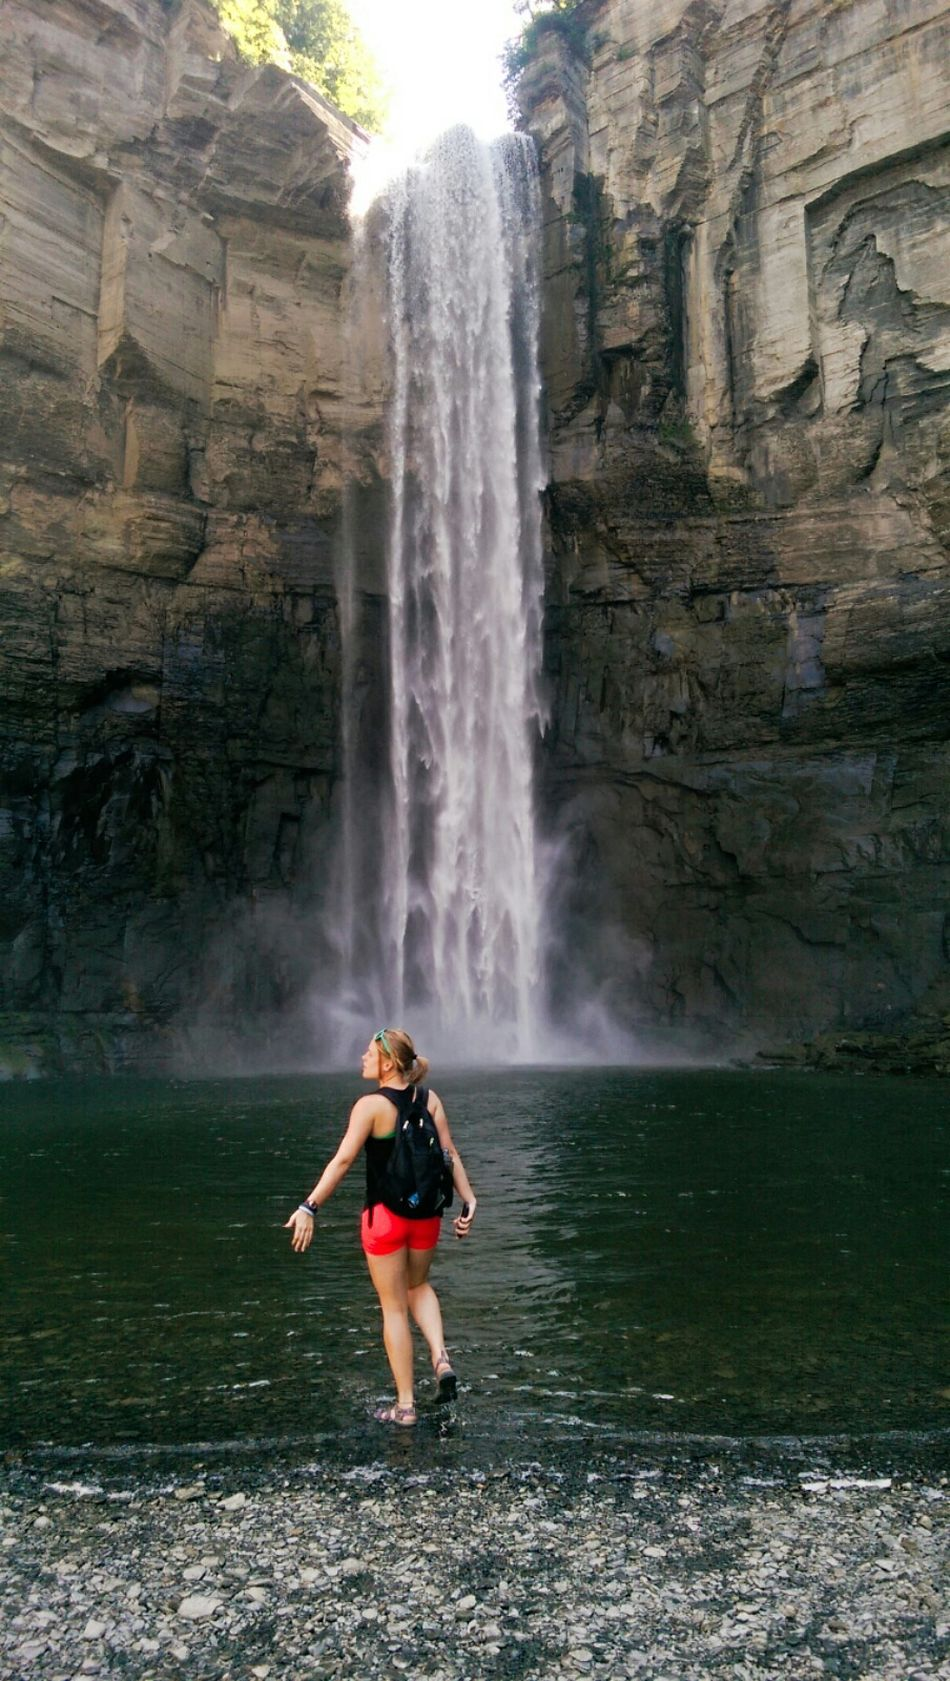 Taughannock Falls State Park Waterfalls Waterfall_collection Nature Nature_collection Naturegirl Hiking Exploring Upstateny